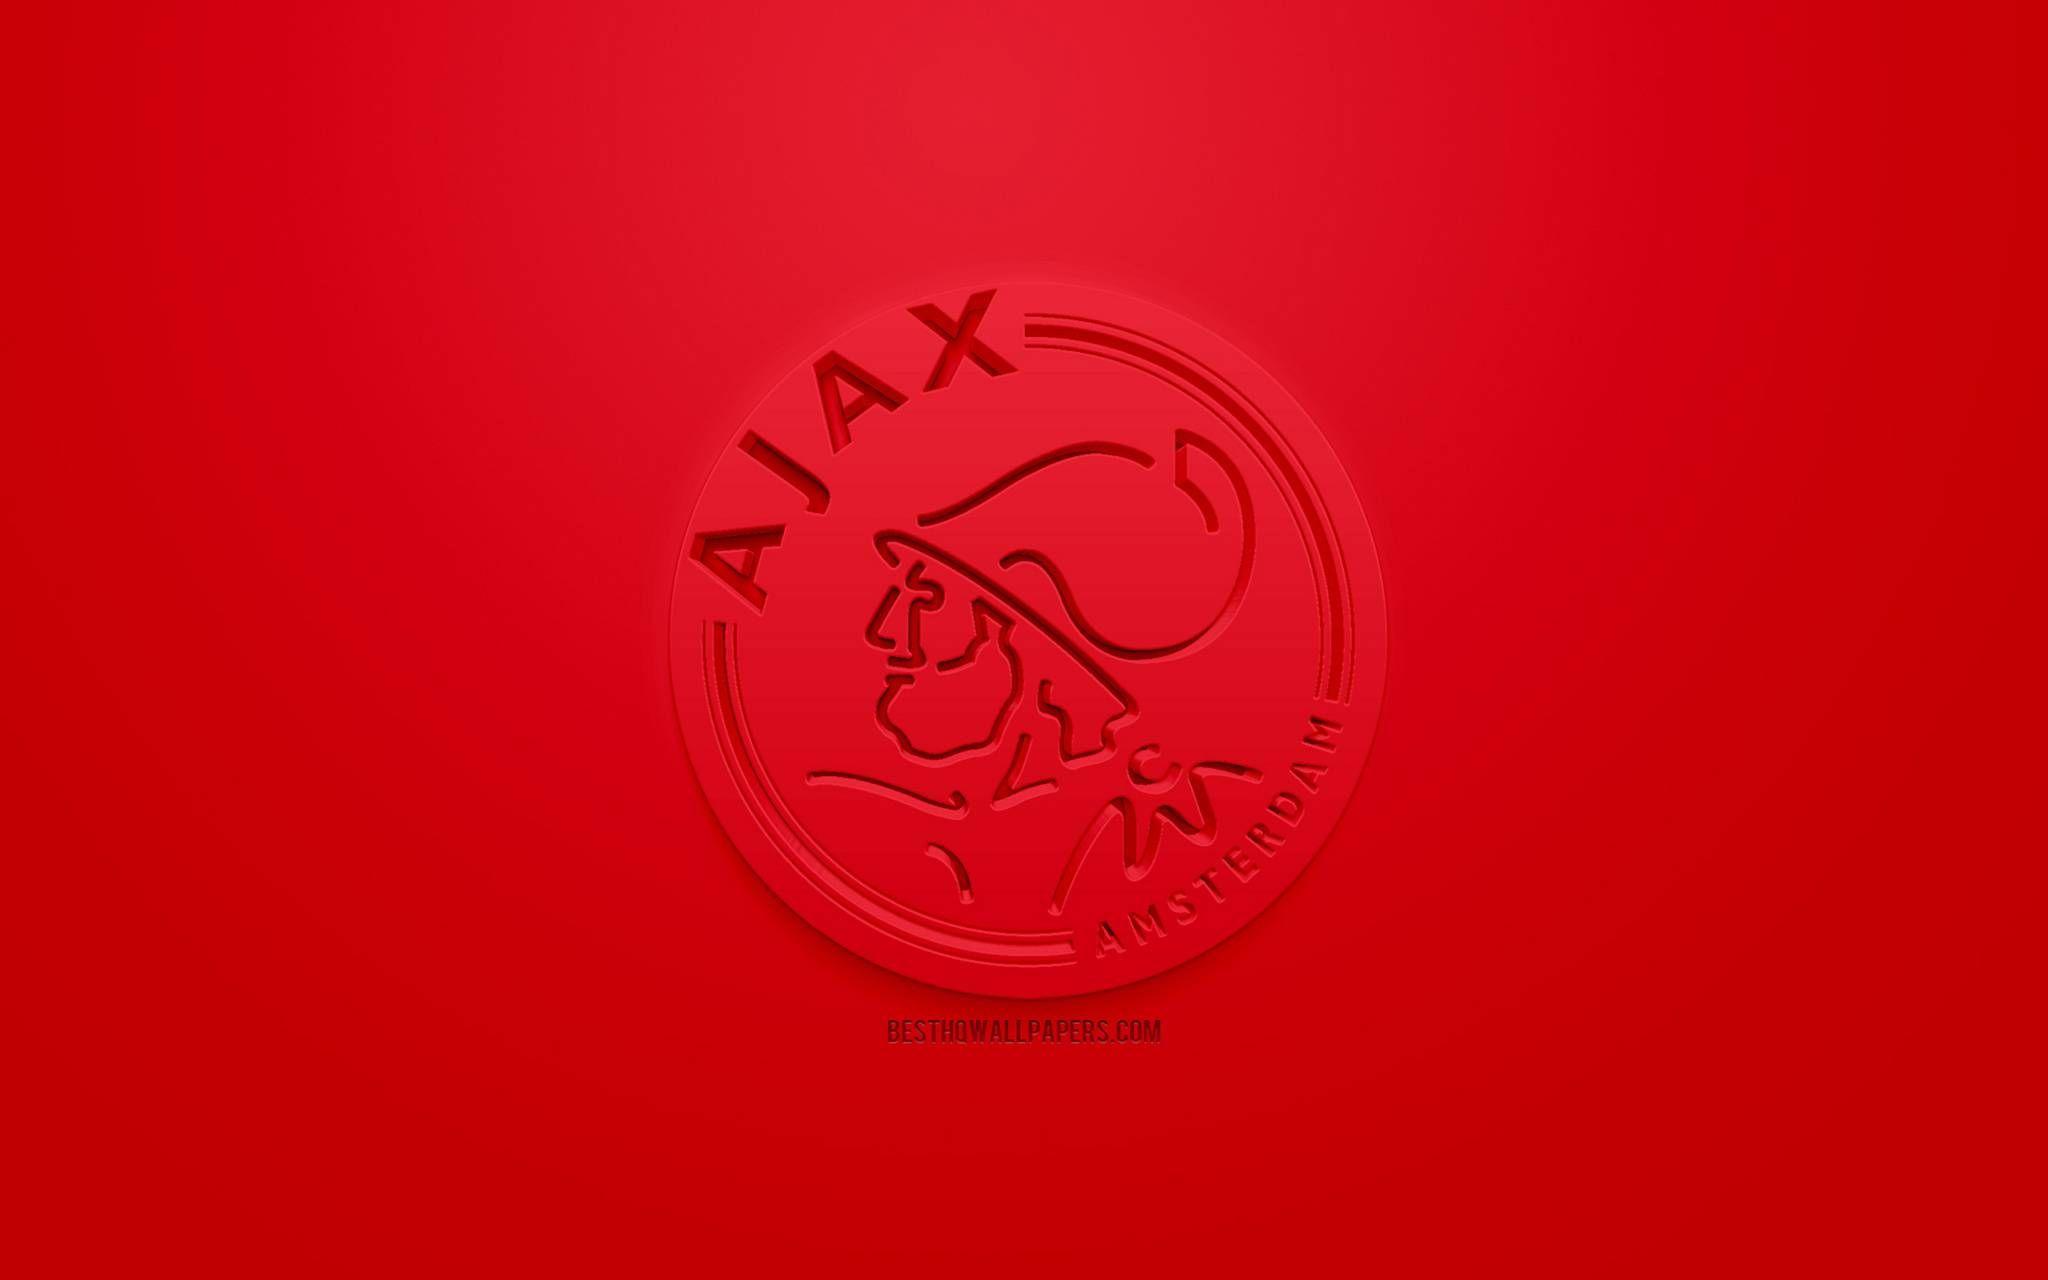 Download Afc Ajax Wallpaper By Elnaztajaddod 5b Free On Zedge Now Browse Millions Of Popular Afc Ajax Wallpapers And Rington Afc Ajax Detroit Tigers Ajax